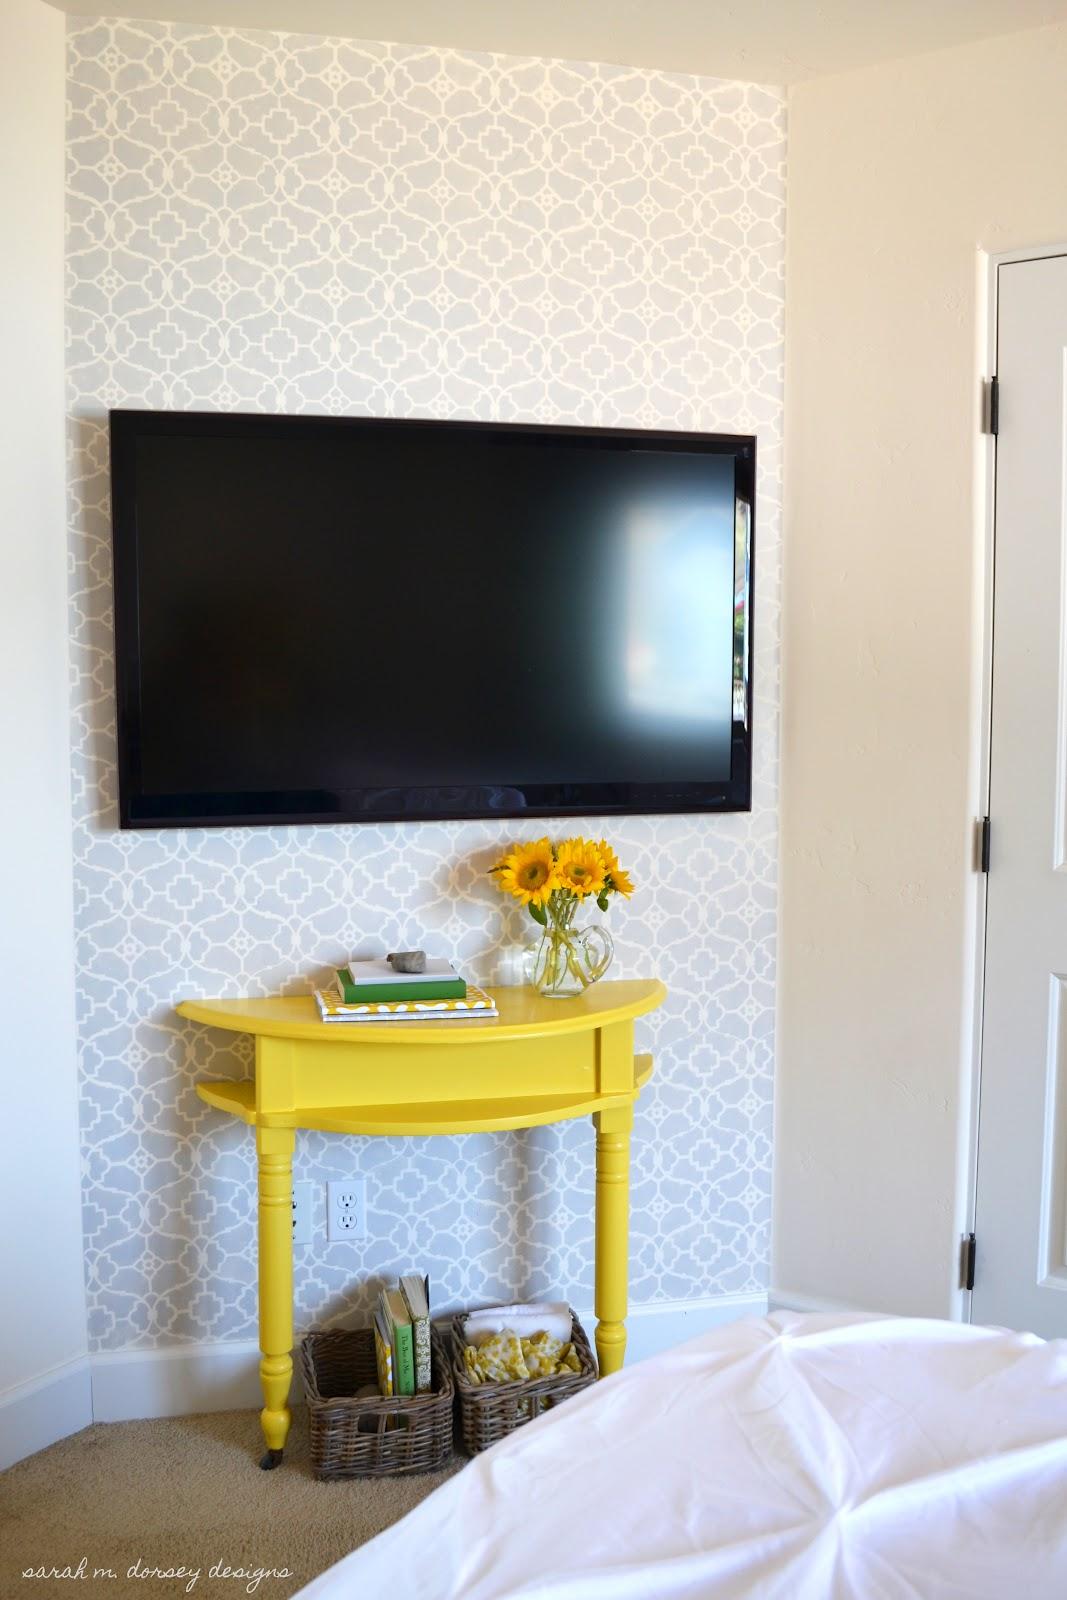 Diy stenciled morrocan rug the 36th avenue for Bedroom stencils designs